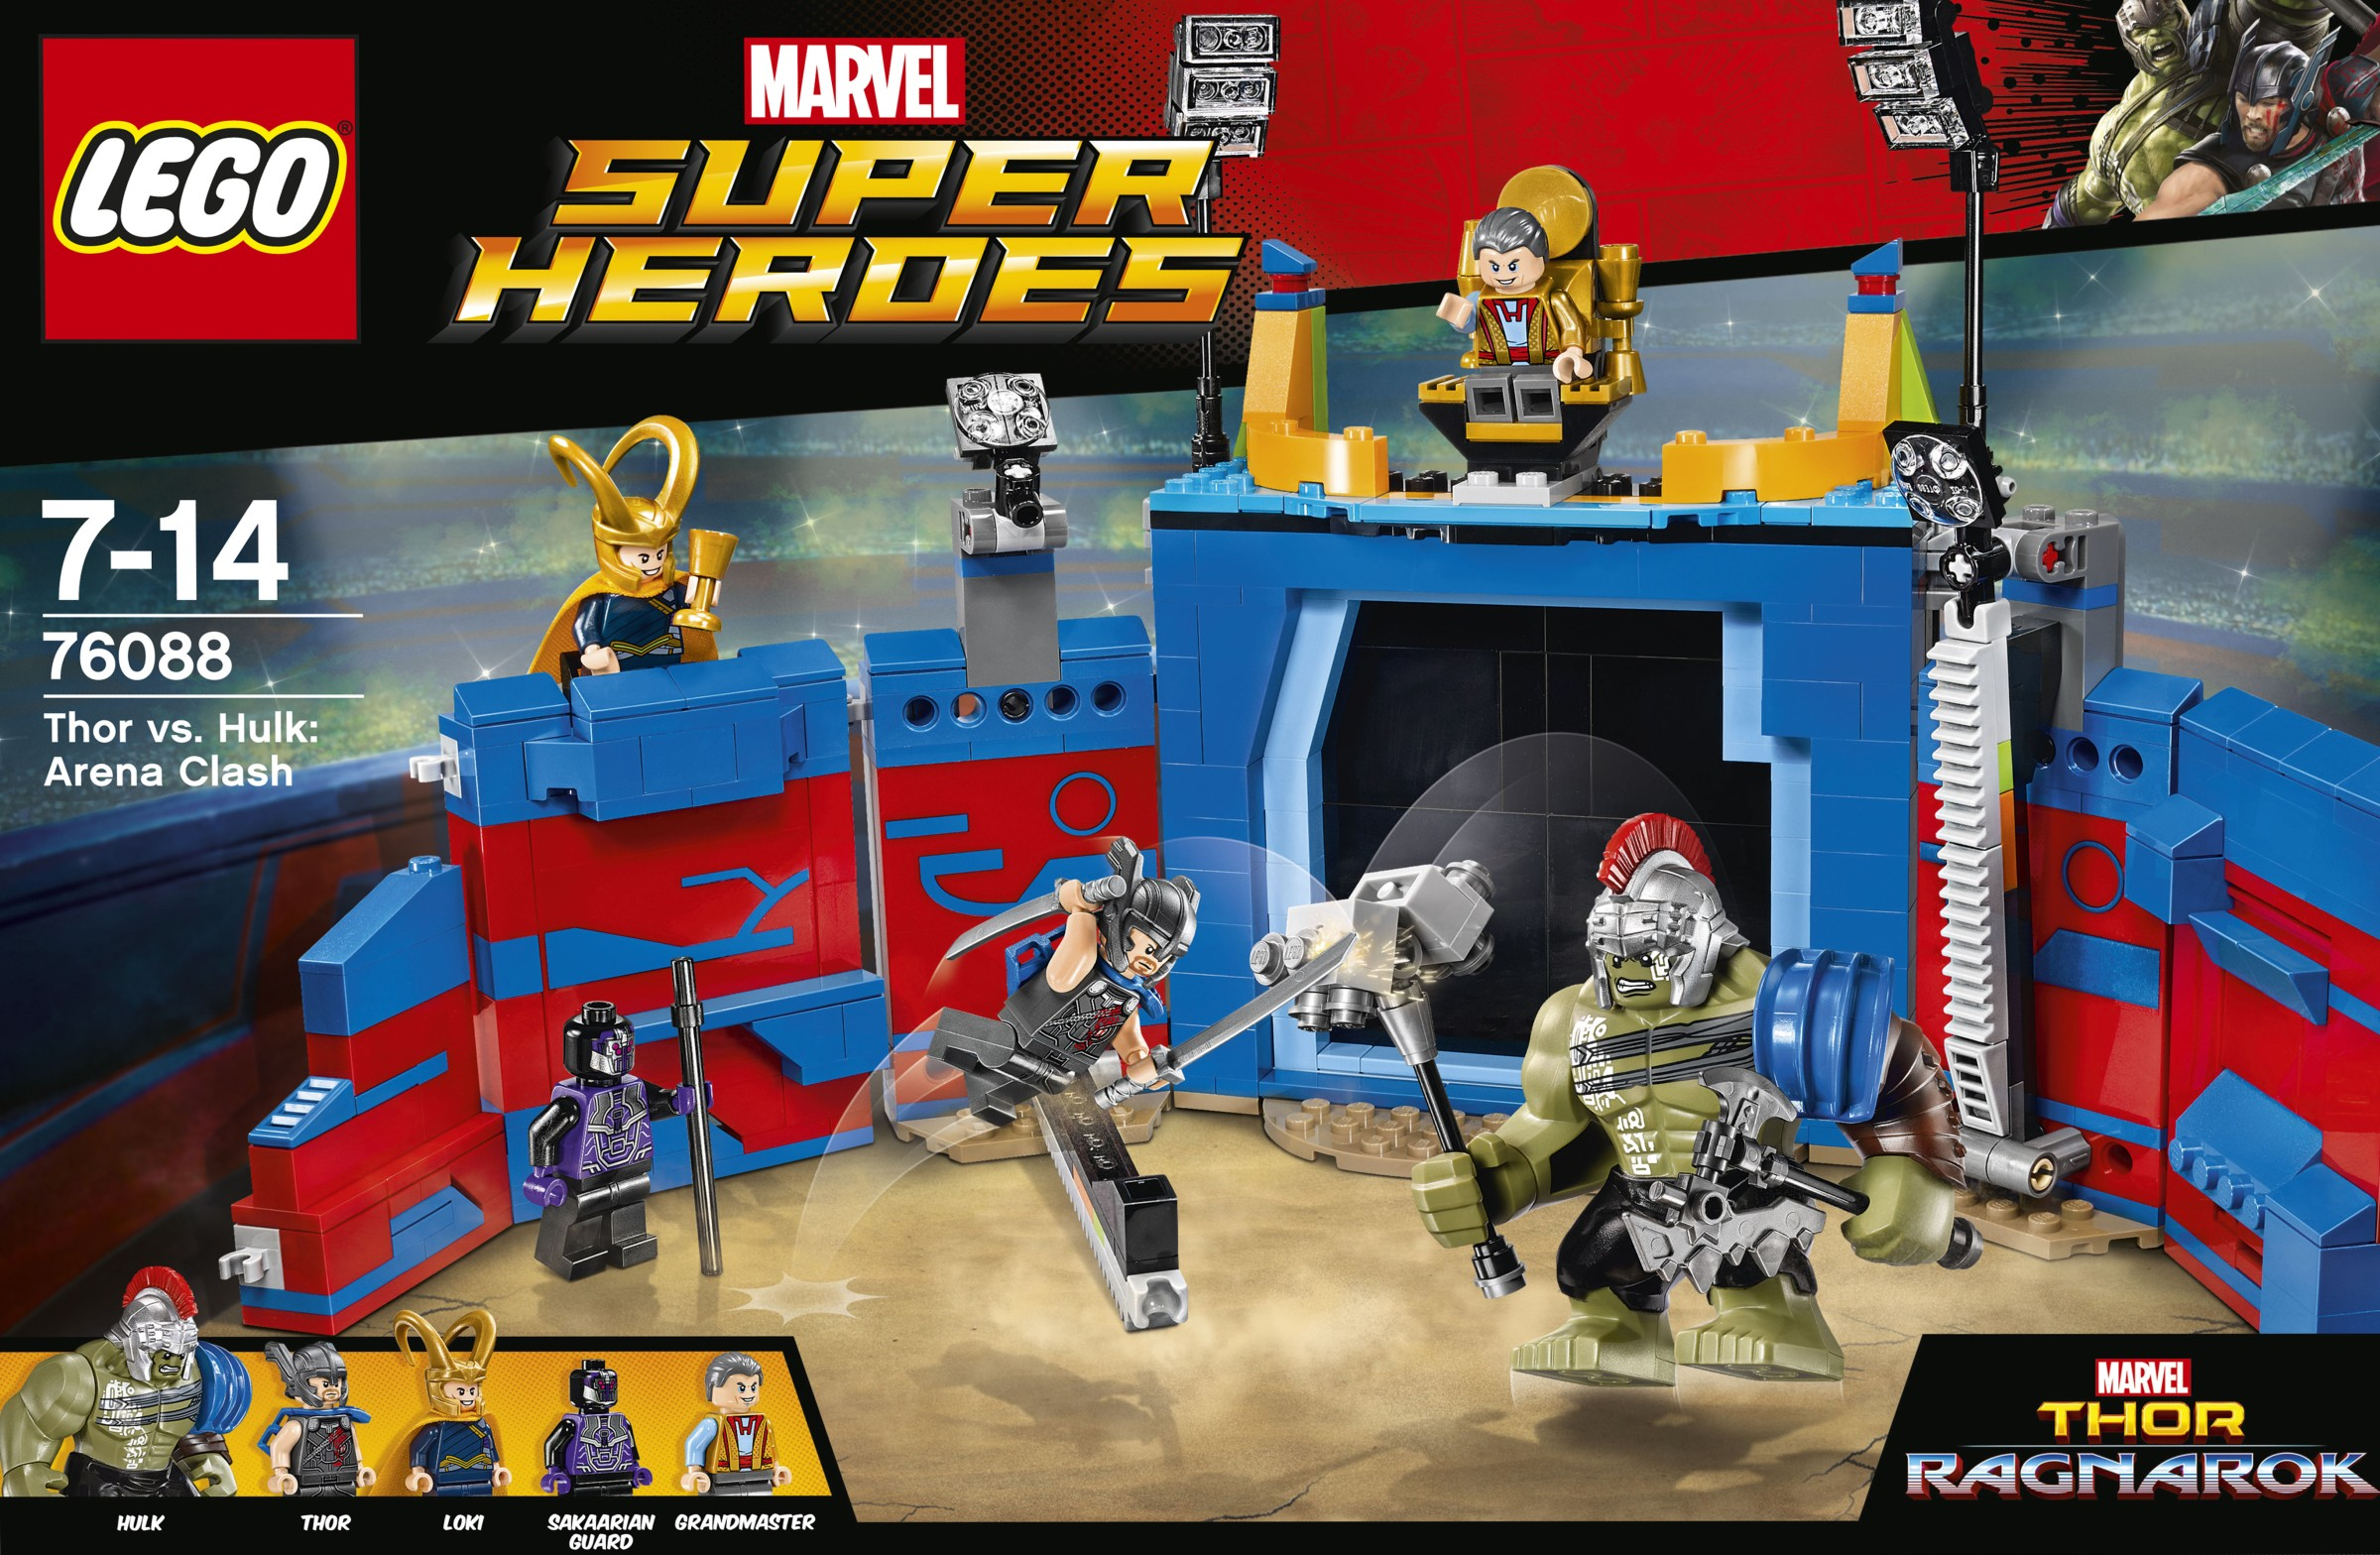 Thor Ragnarok : premiers visuels officiels des deux sets